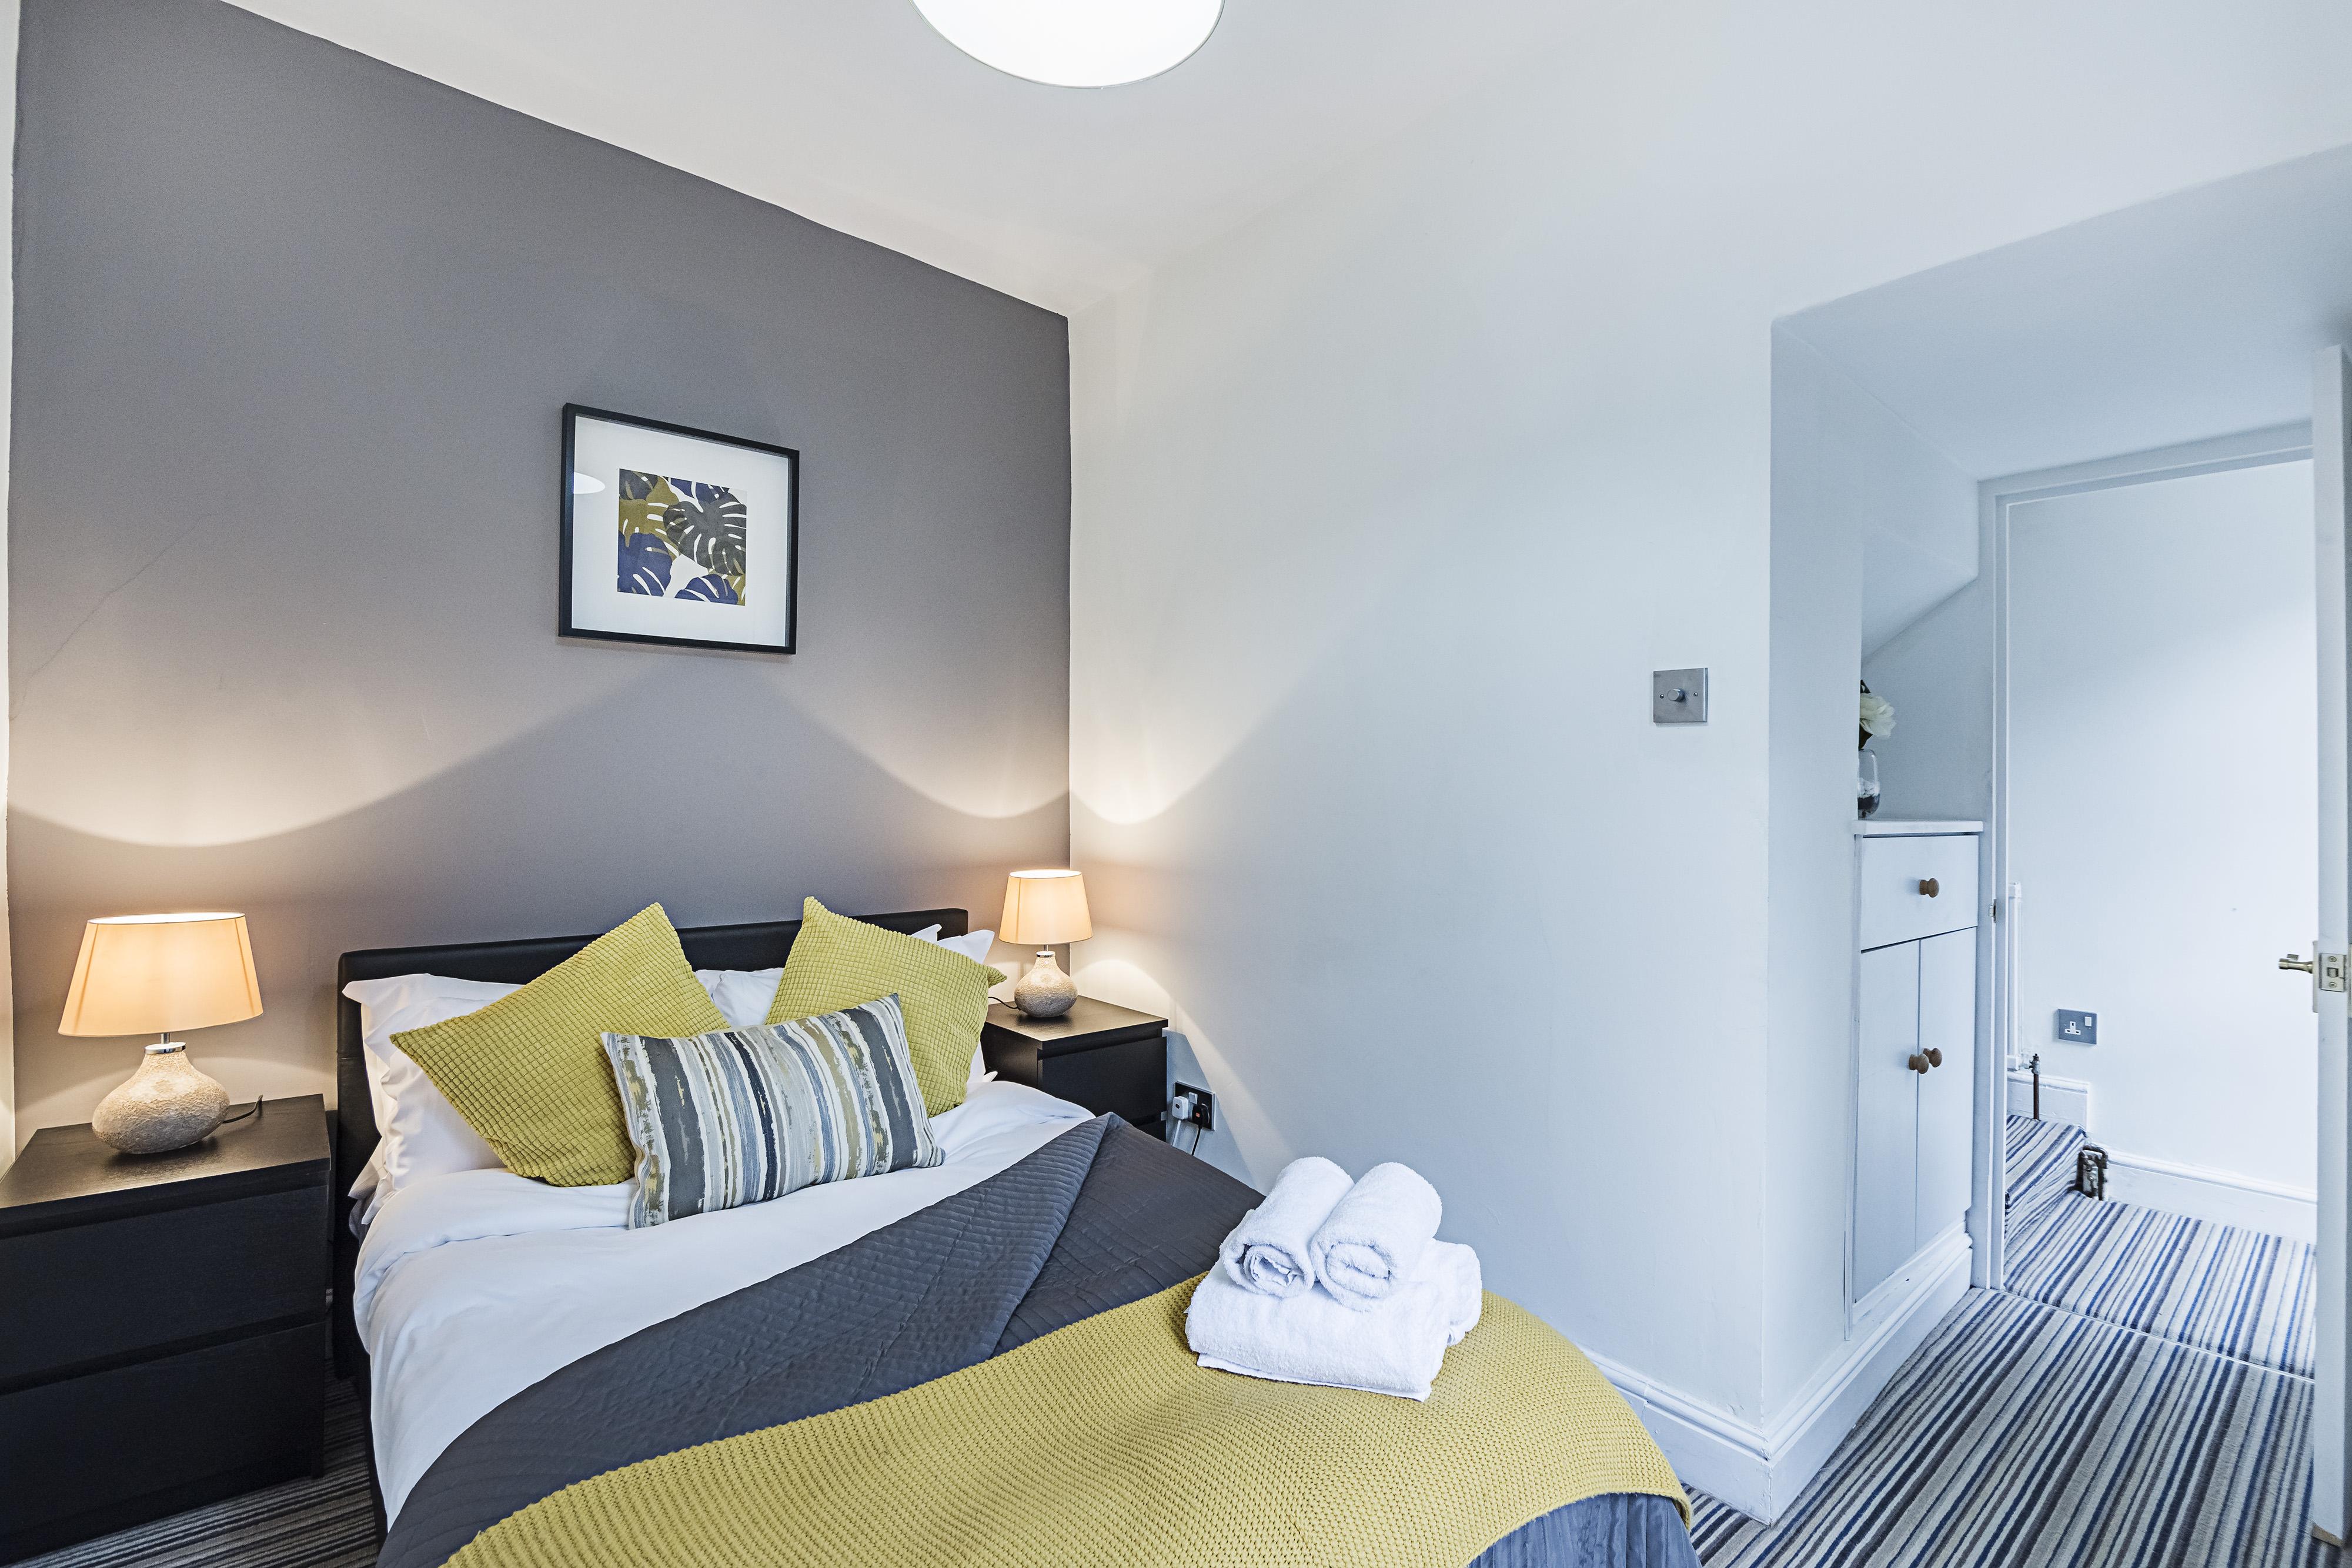 Mornington Crescent Apartment